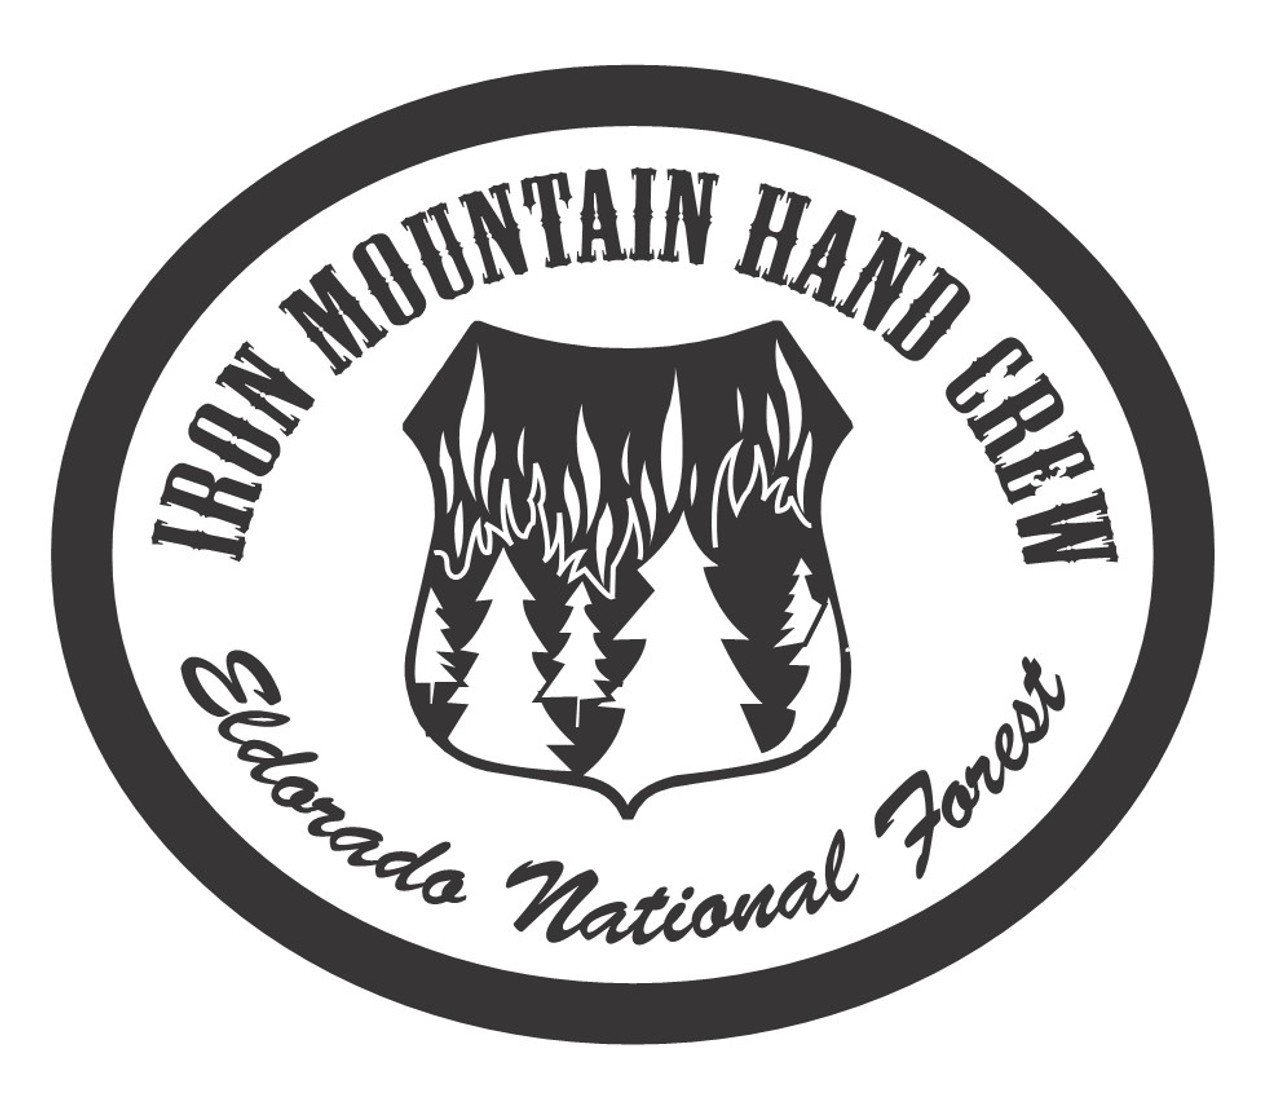 Iron Mountain Hand Crew Eldorado National Forest Buckle (RESTRICTED)